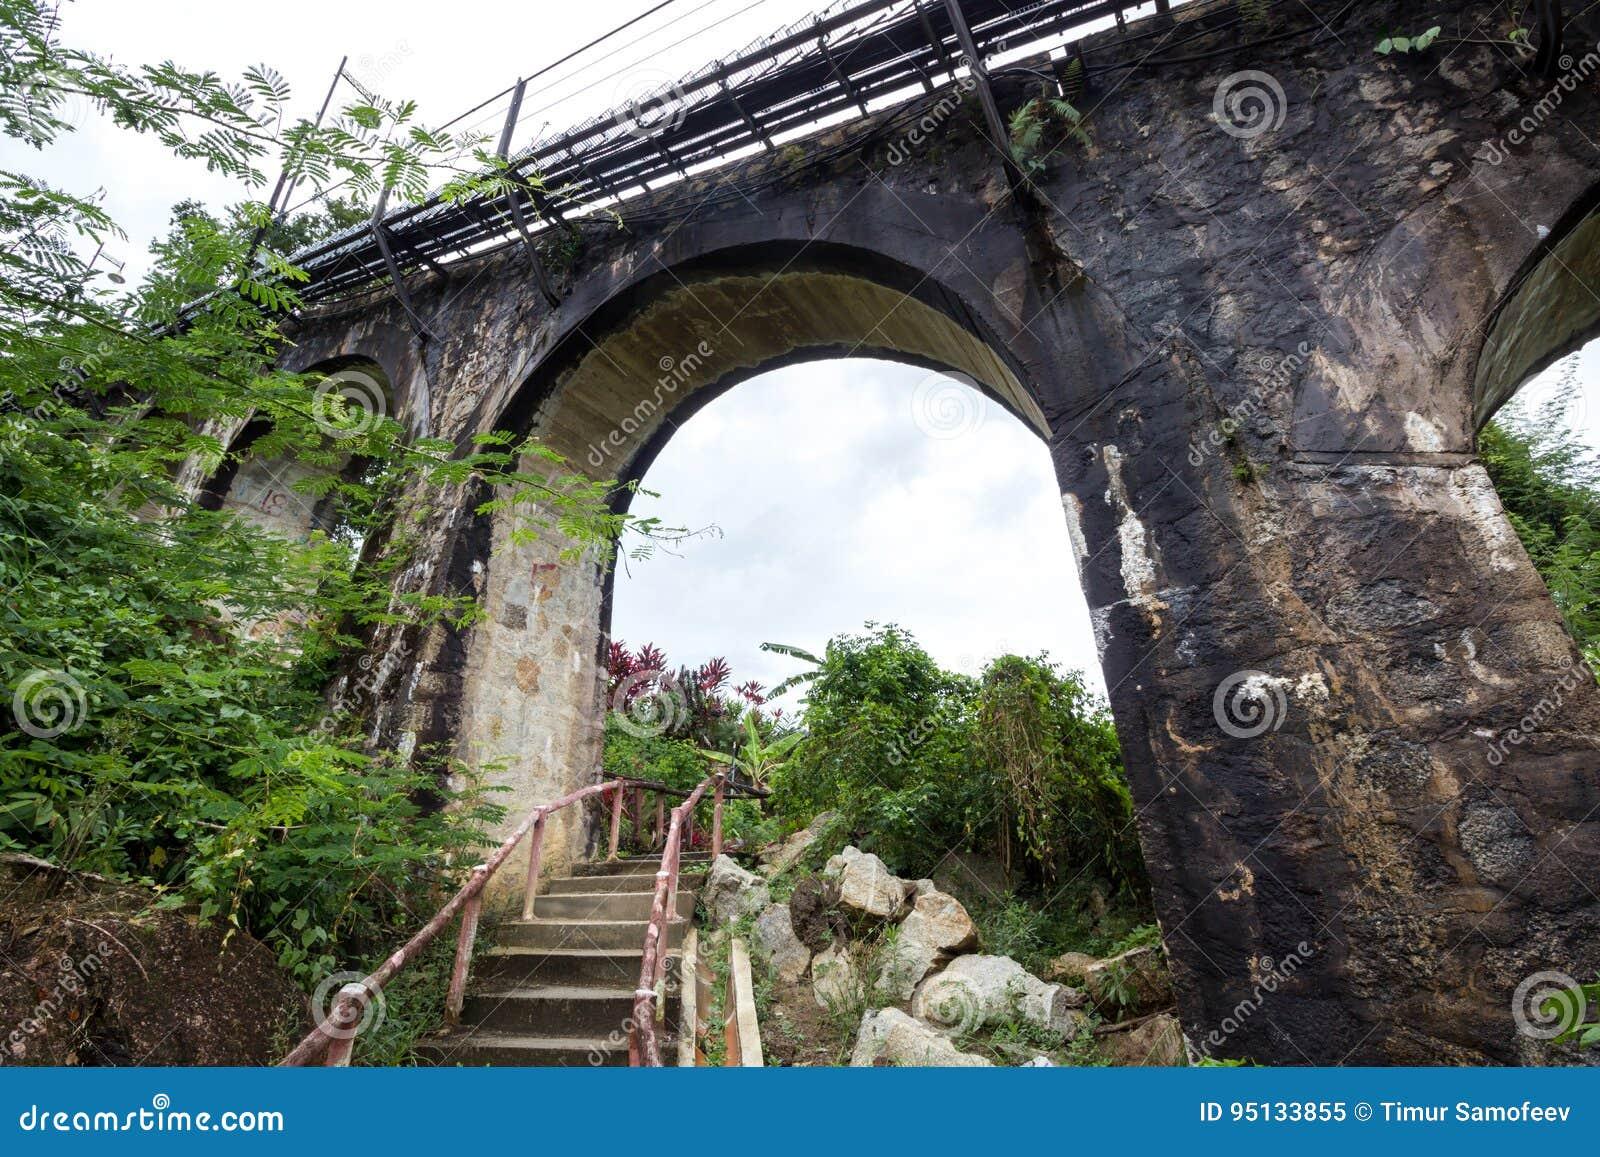 Railway bridge in the forest